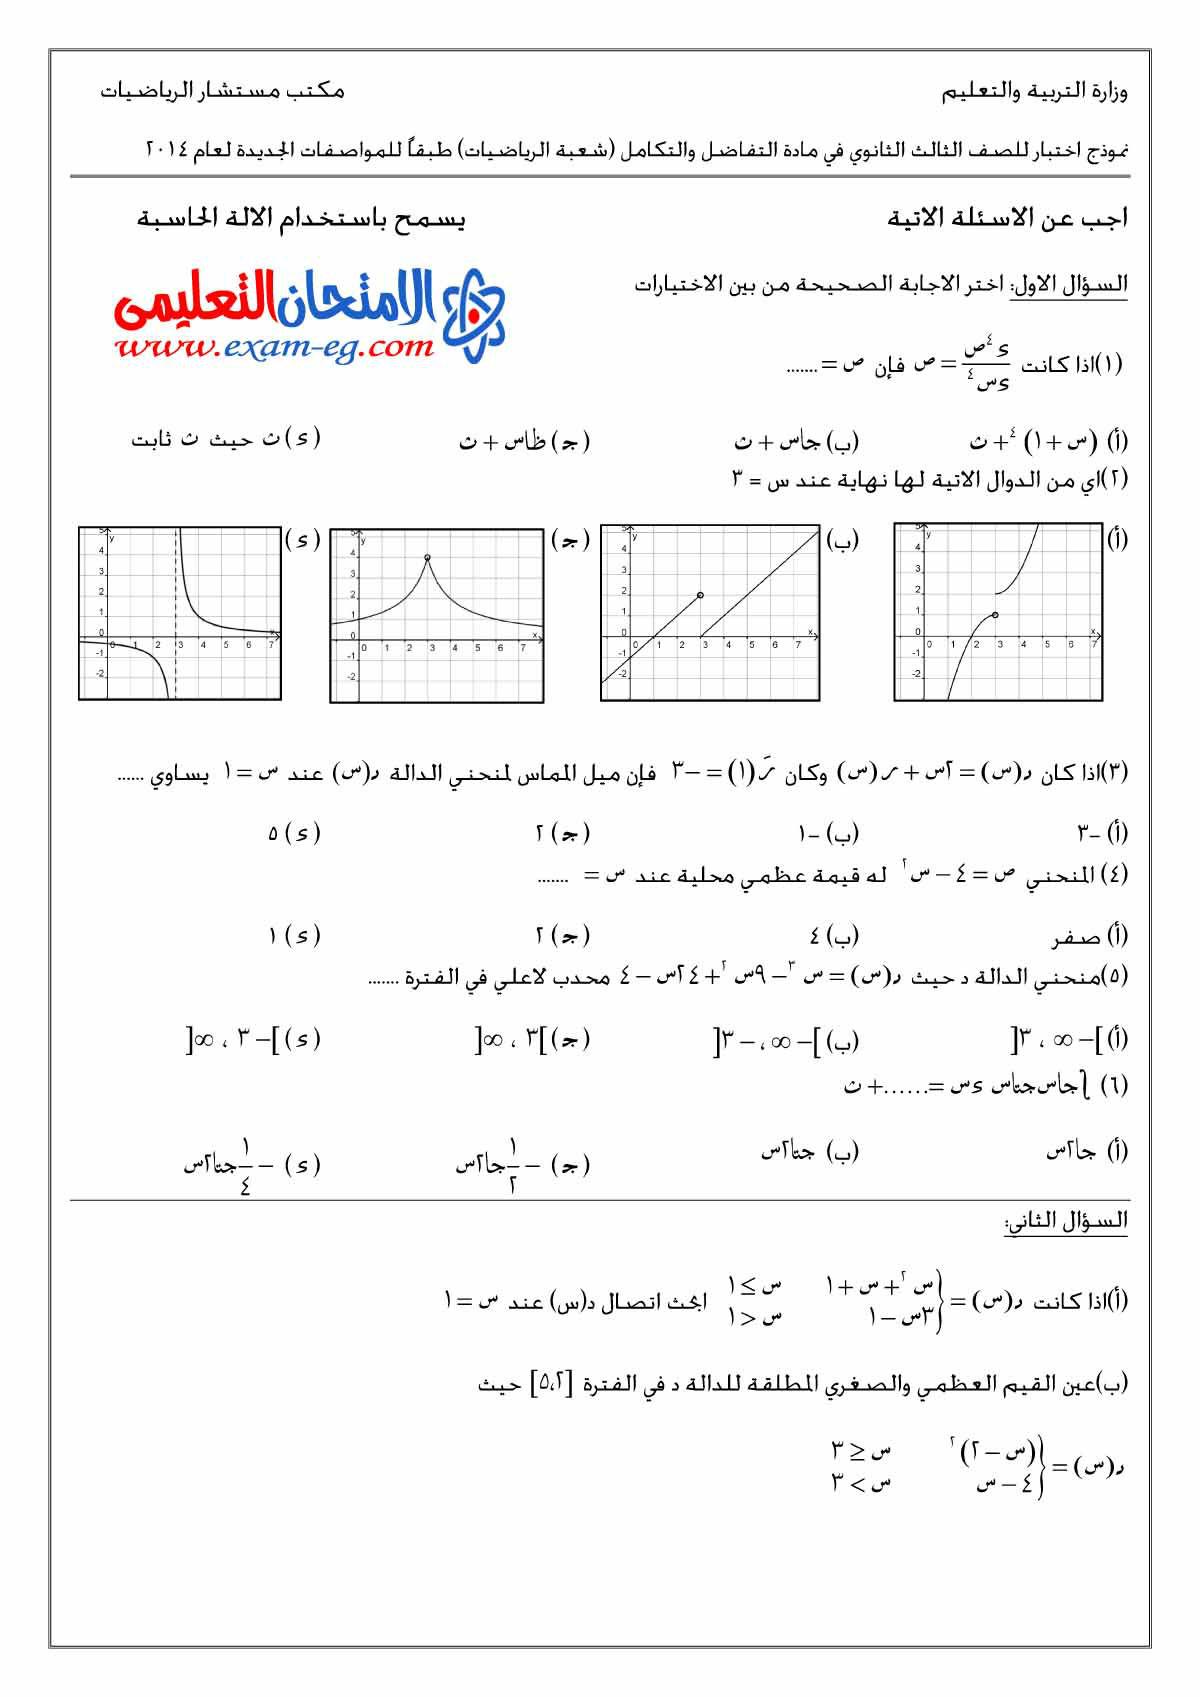 exam-eg.com_1403332690463.jpg